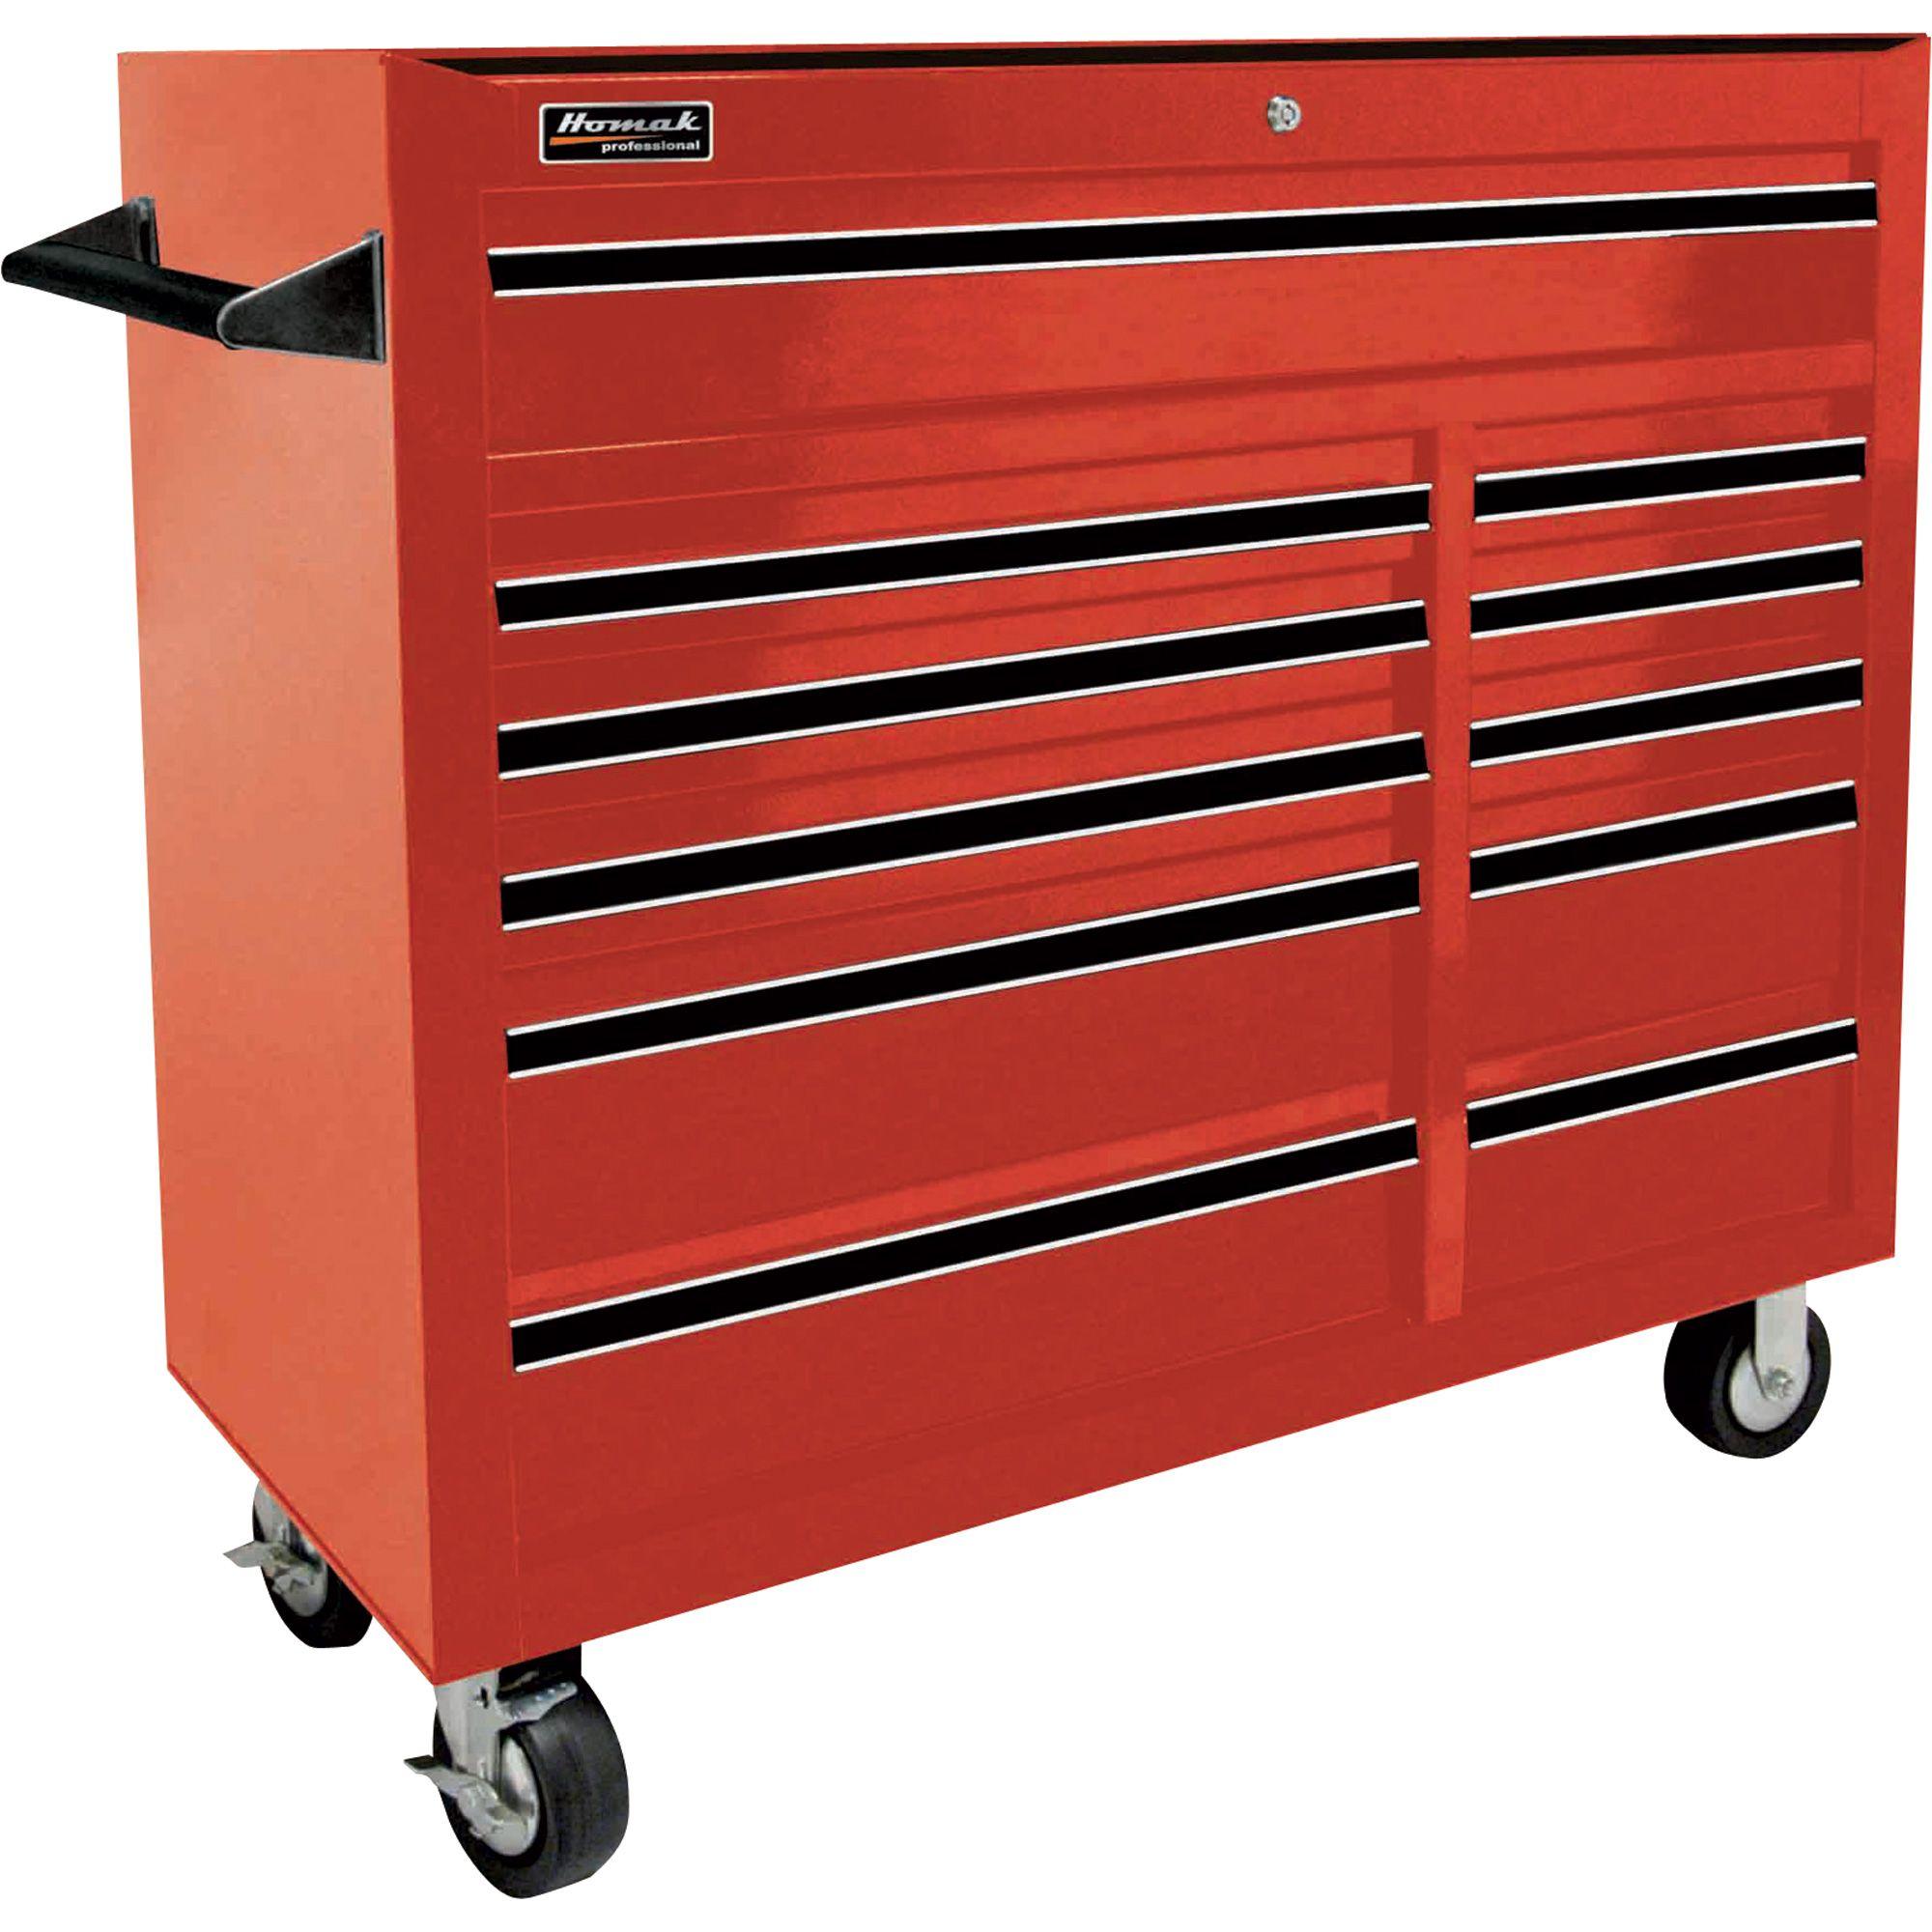 Nice 11 Drawer Rolling Tool Cabinet U2014 42in.W X